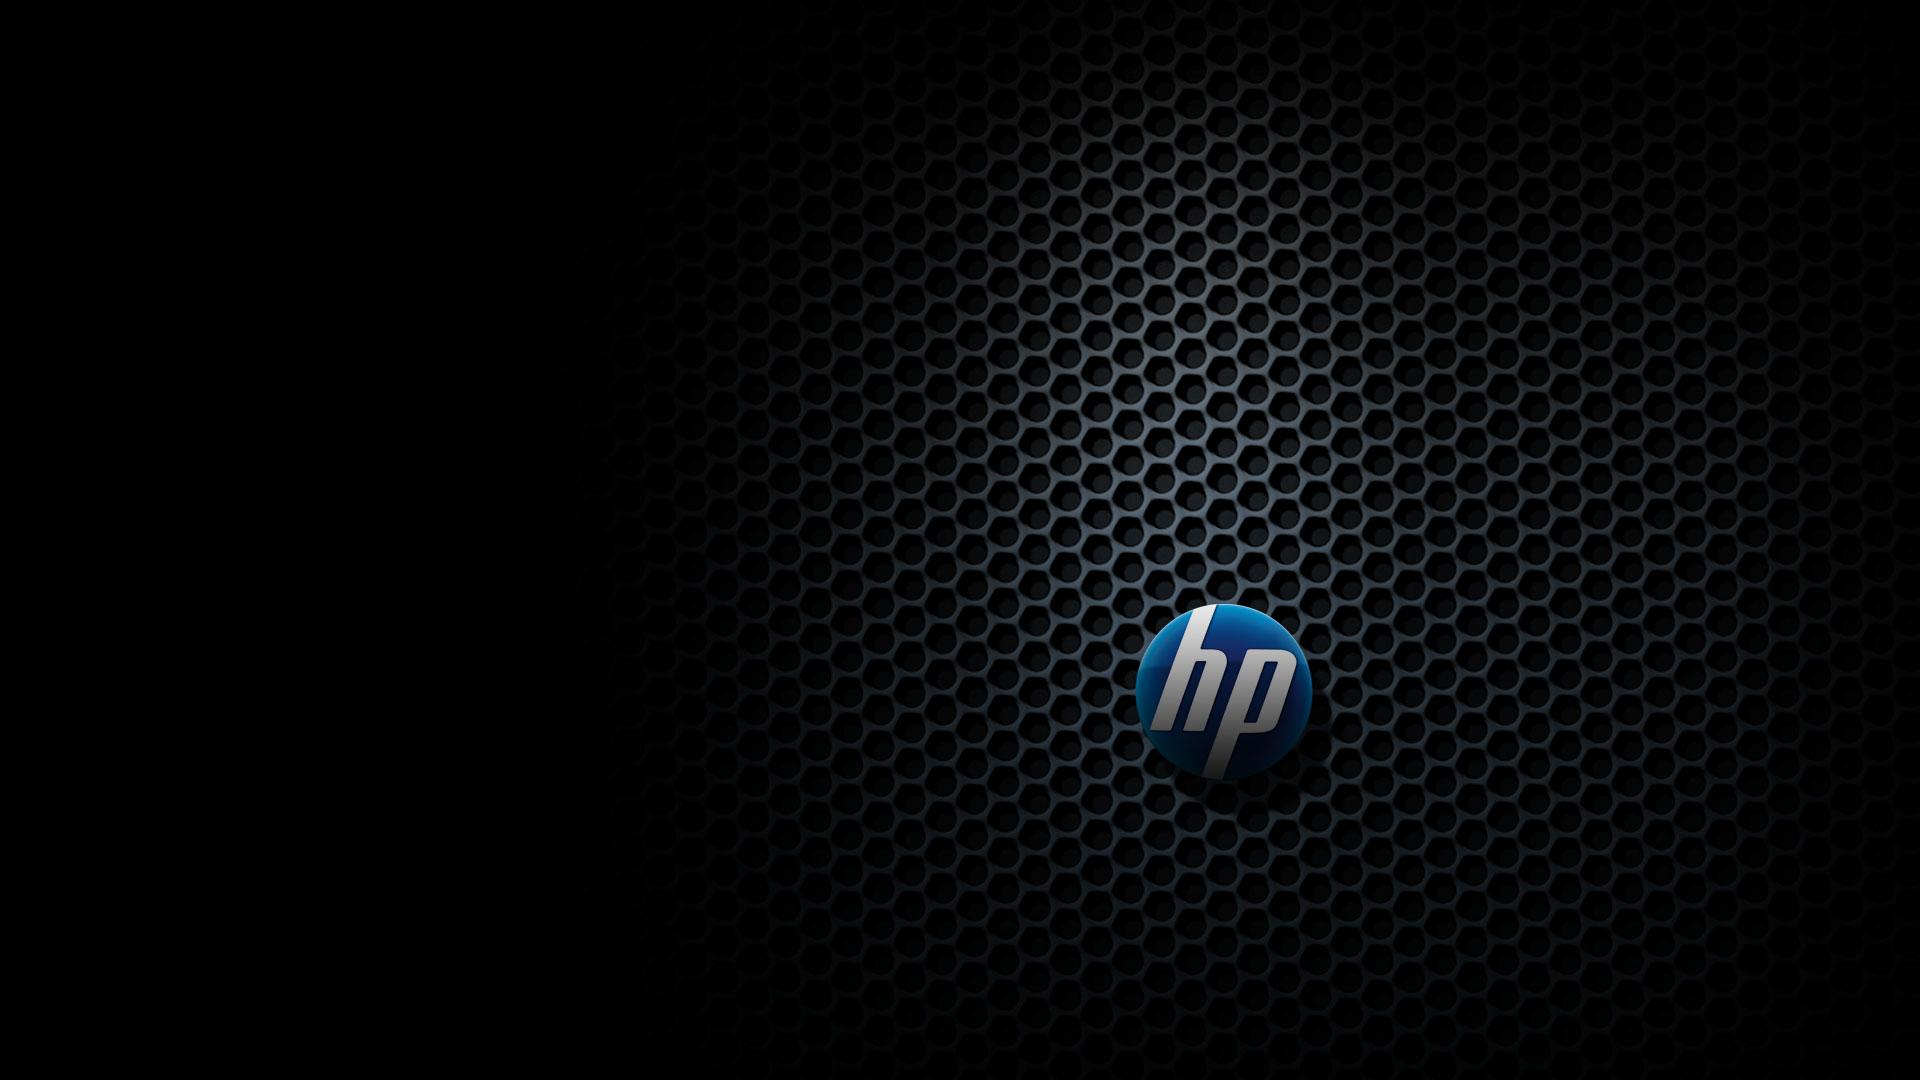 hp desktop wallpapers hd 1080p Desktop Backgrounds for HD 1920x1080